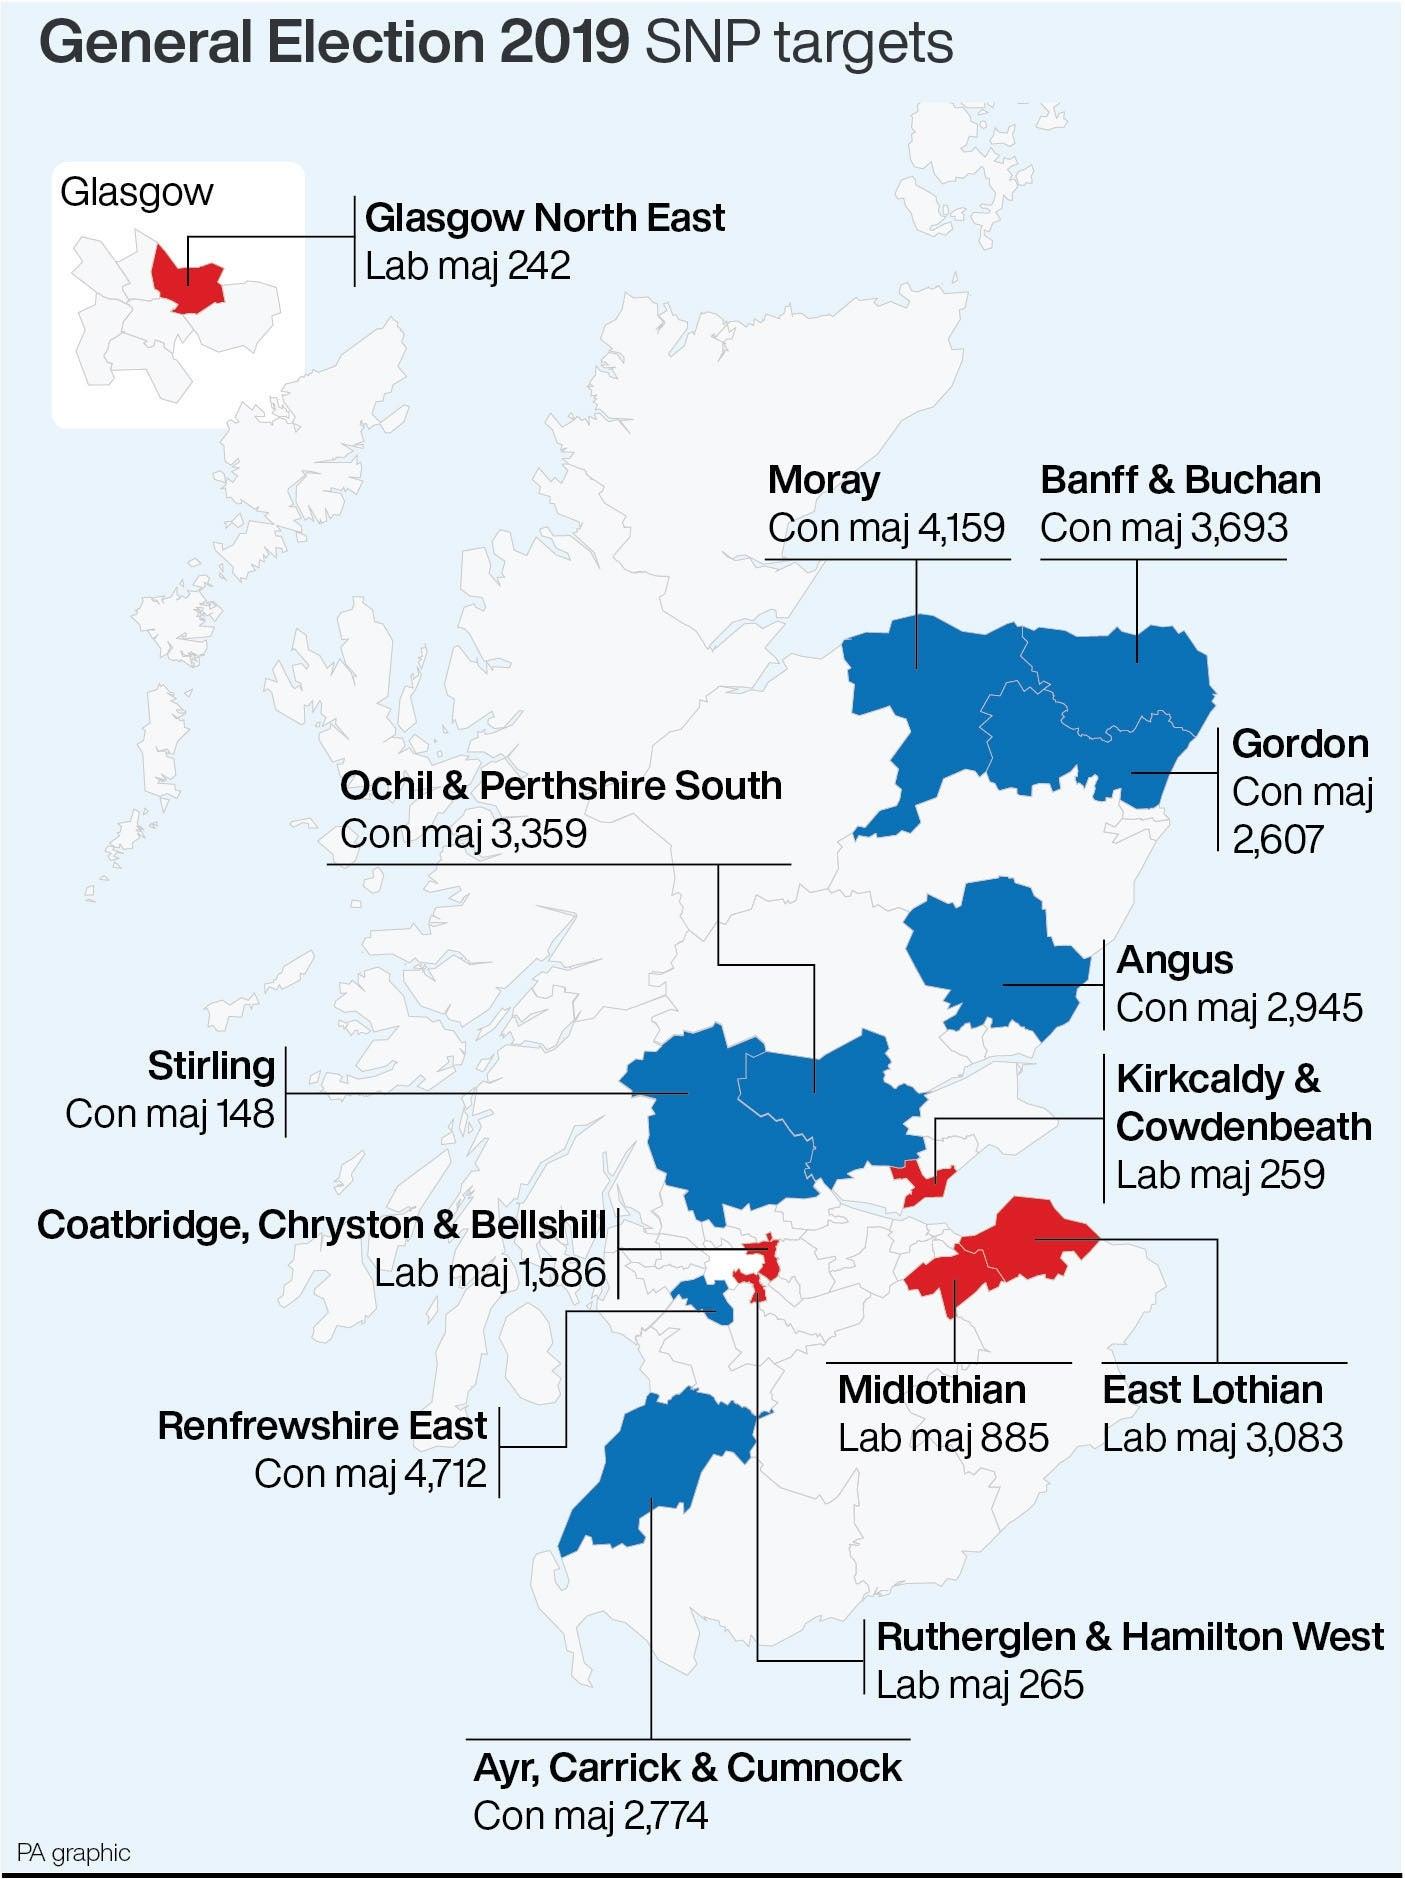 SNP targets